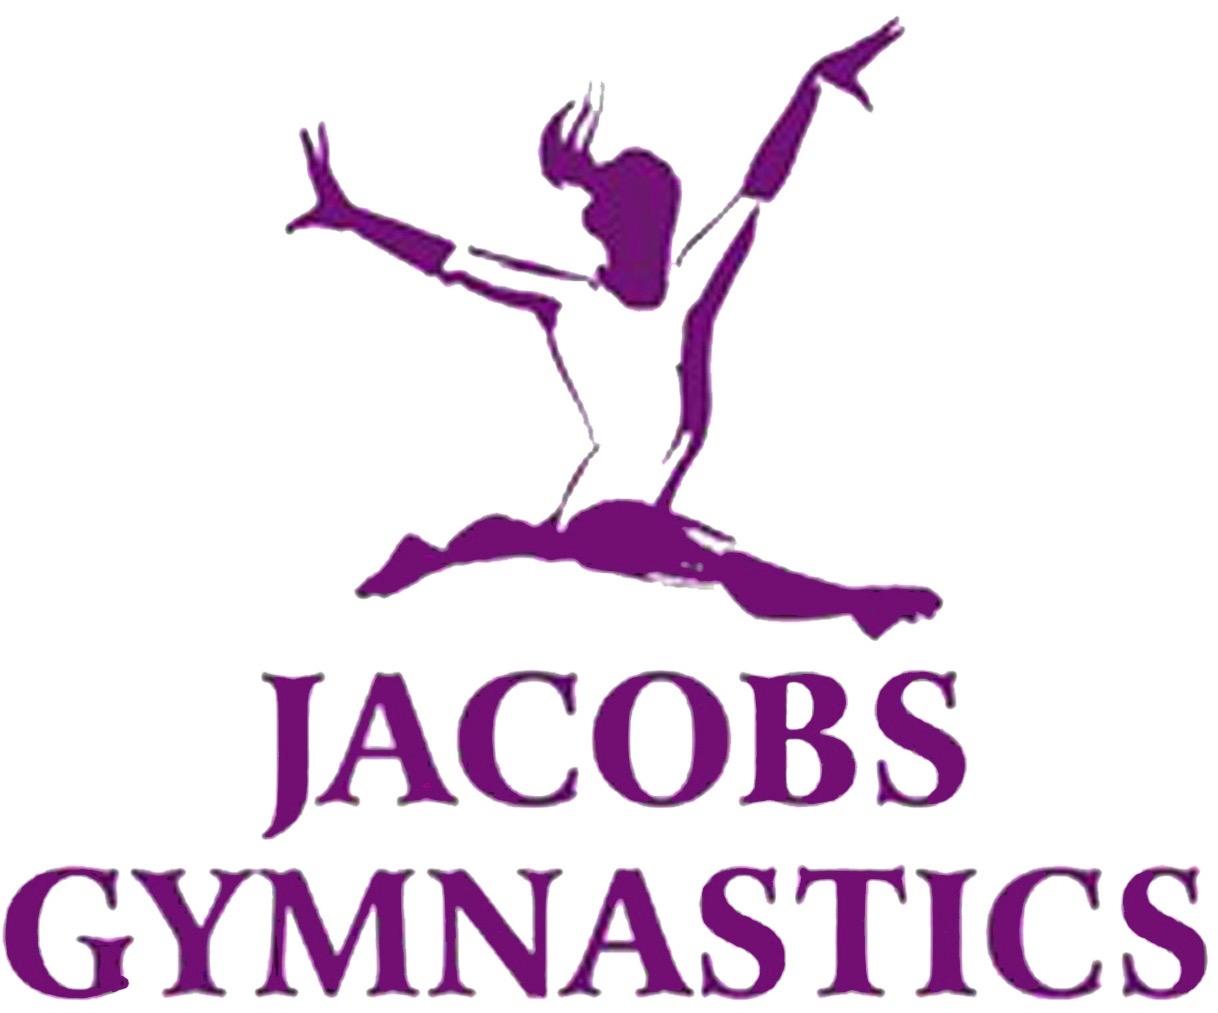 Jacobs Gymnastics